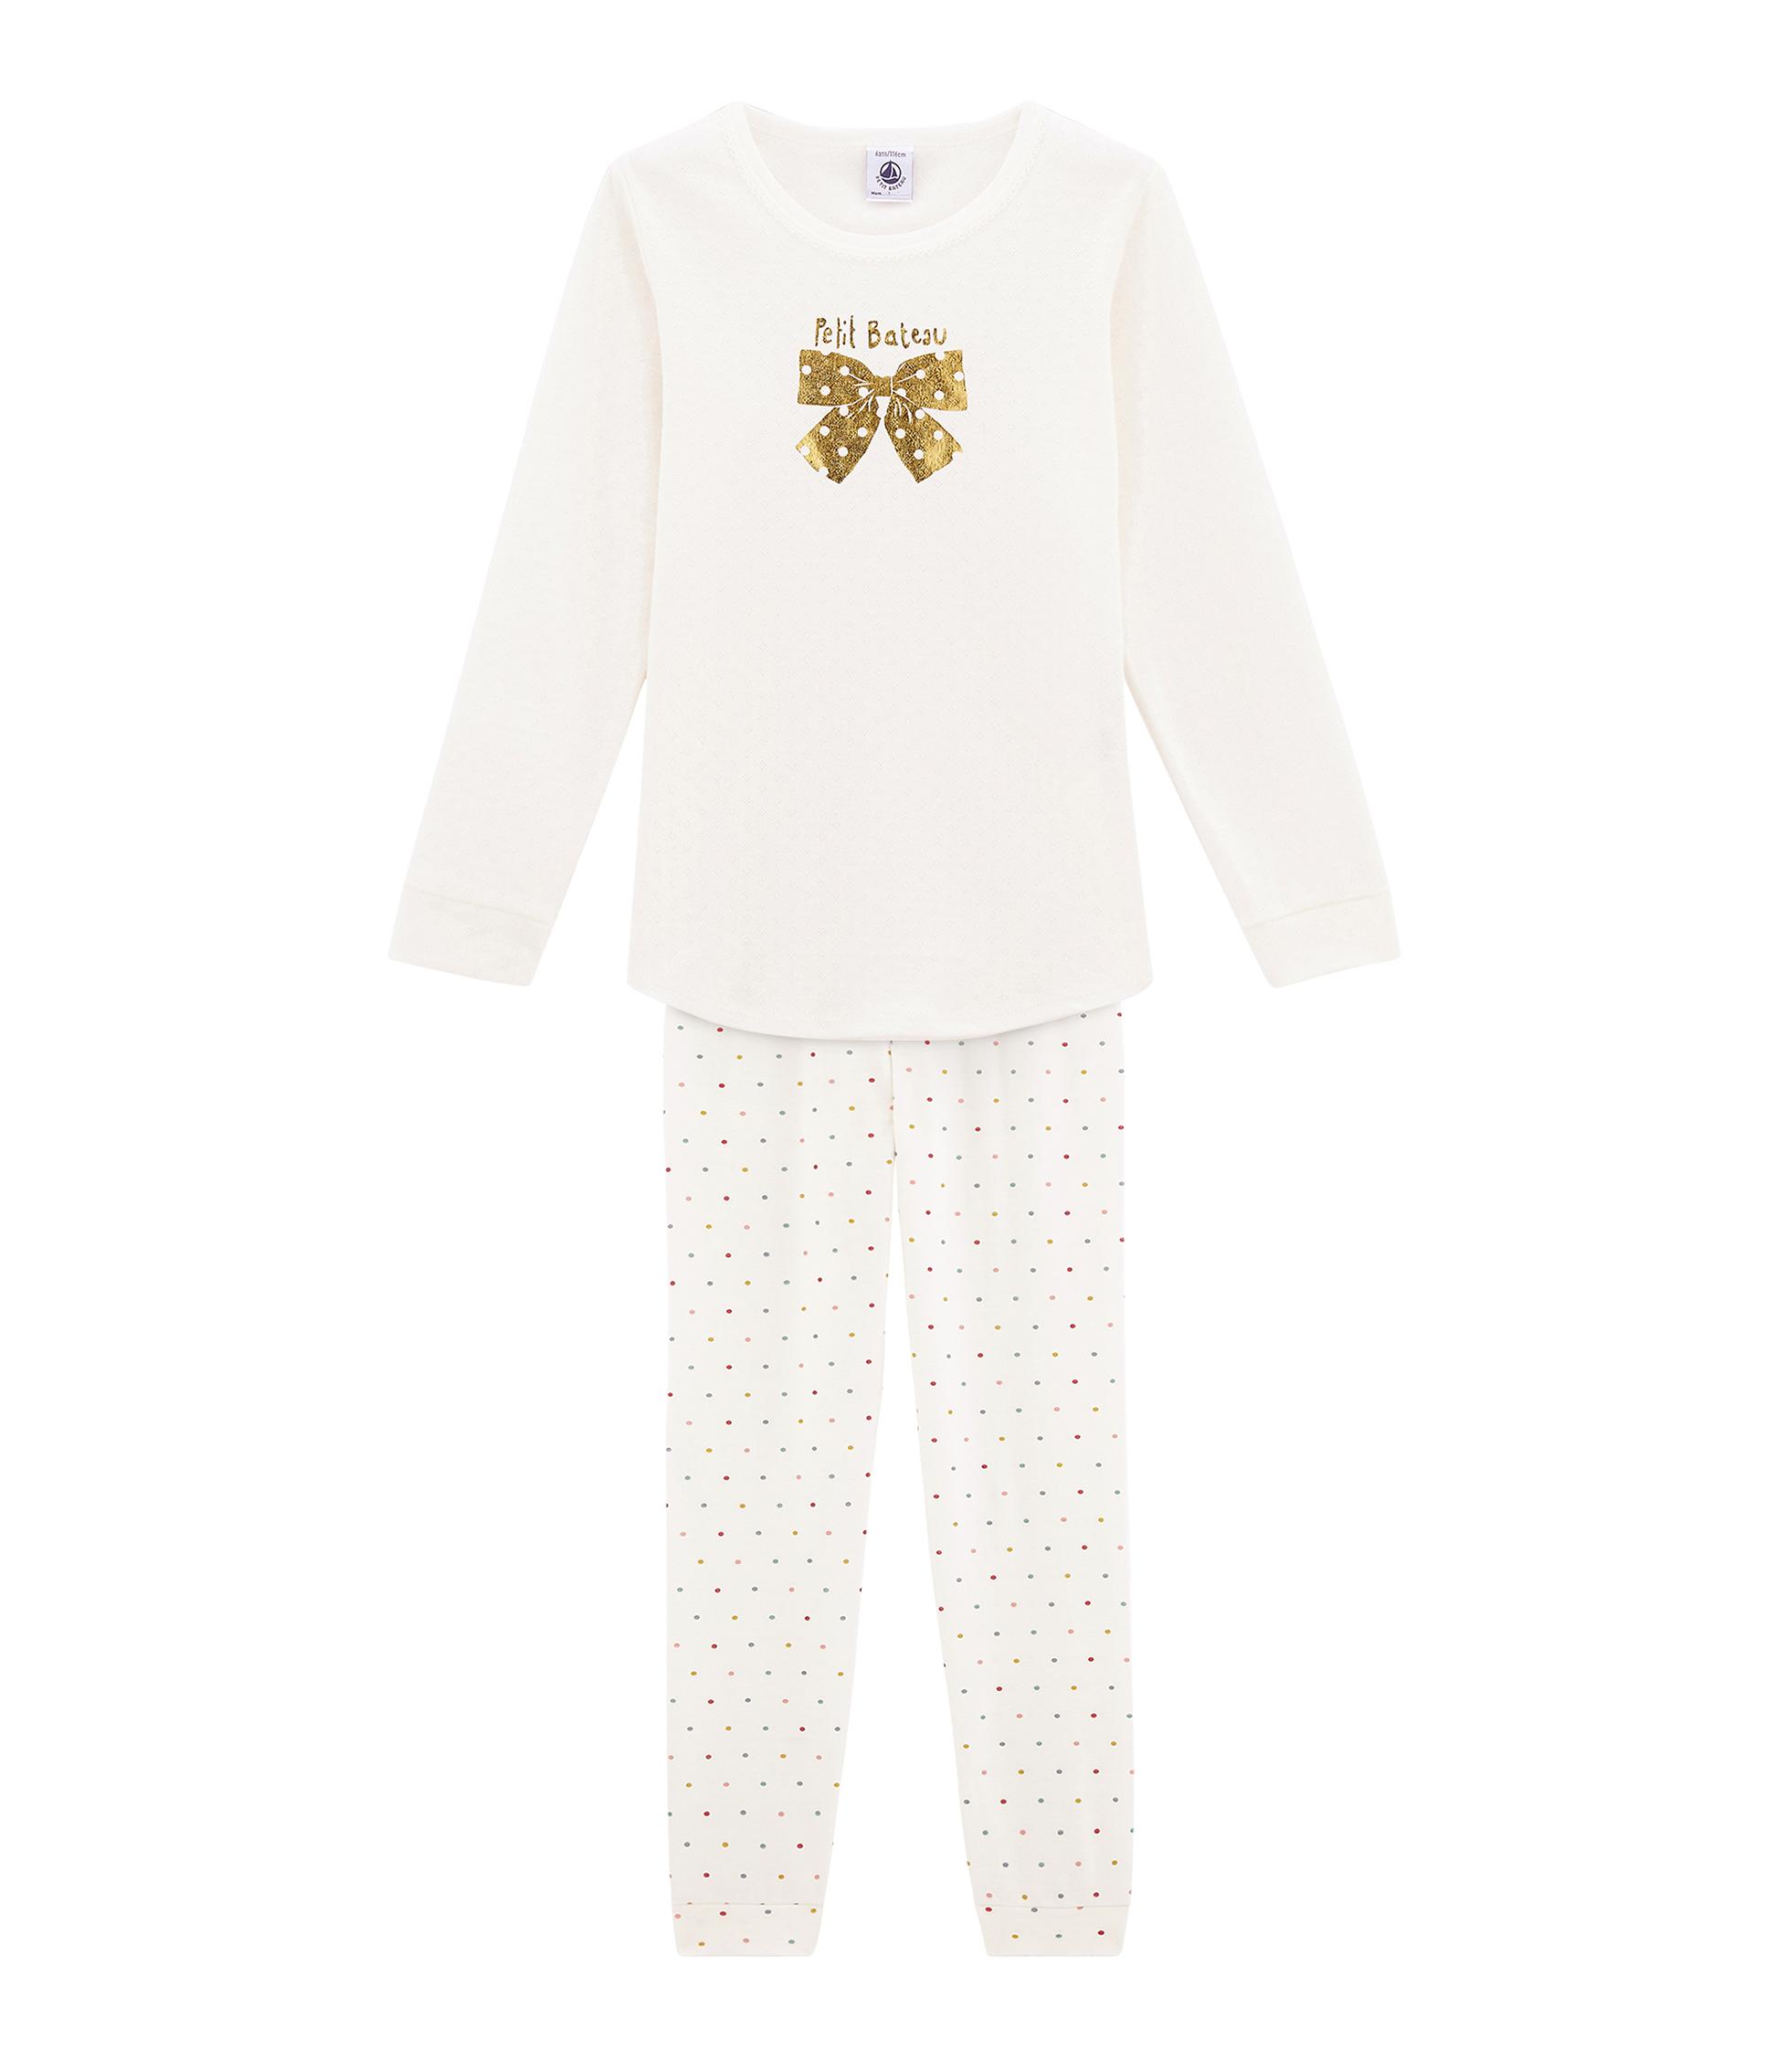 Pyjama Petite Fille En Cote